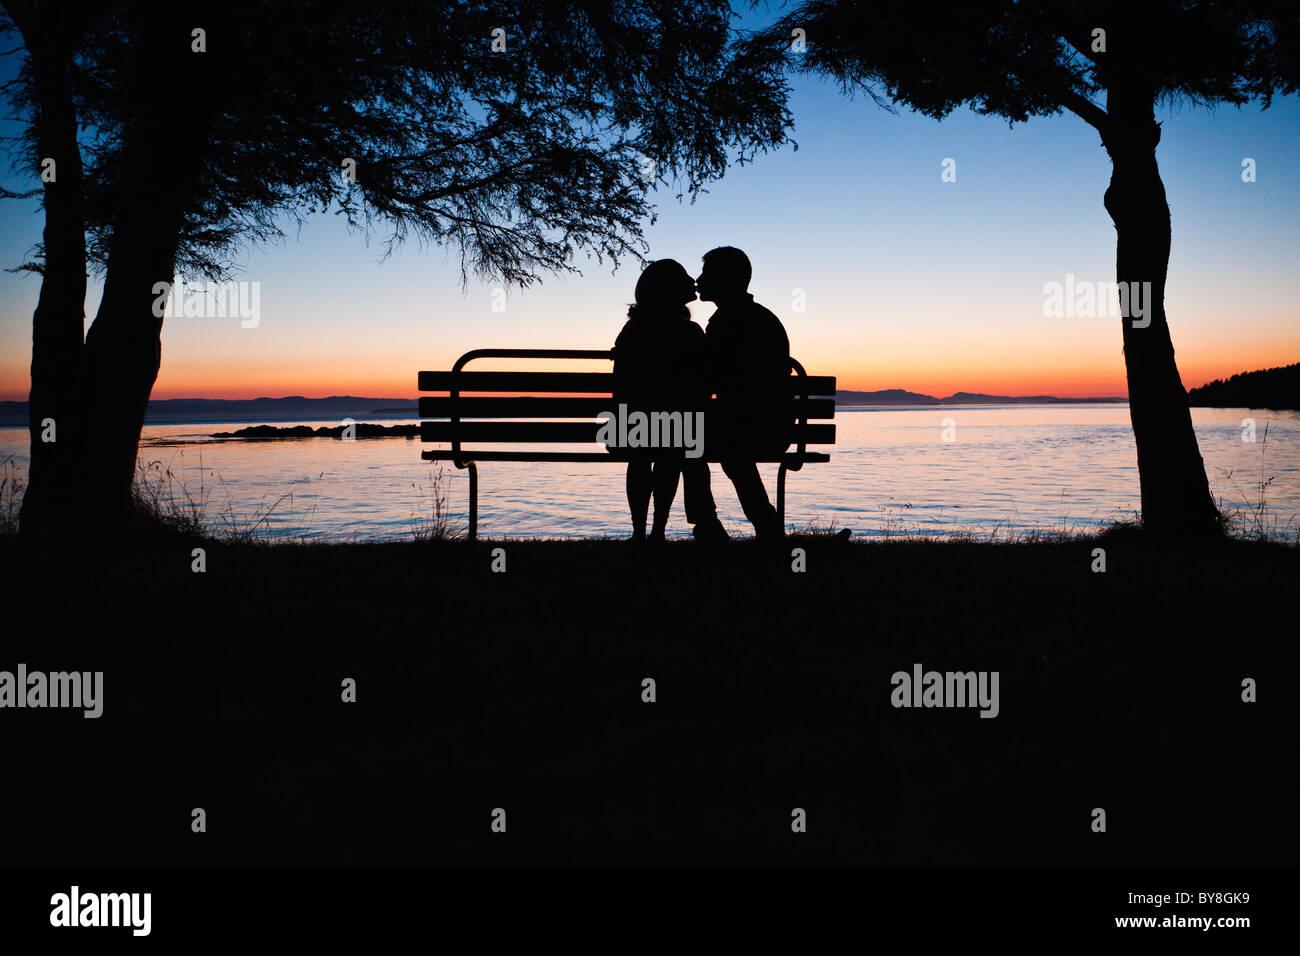 San juan county jewish single men